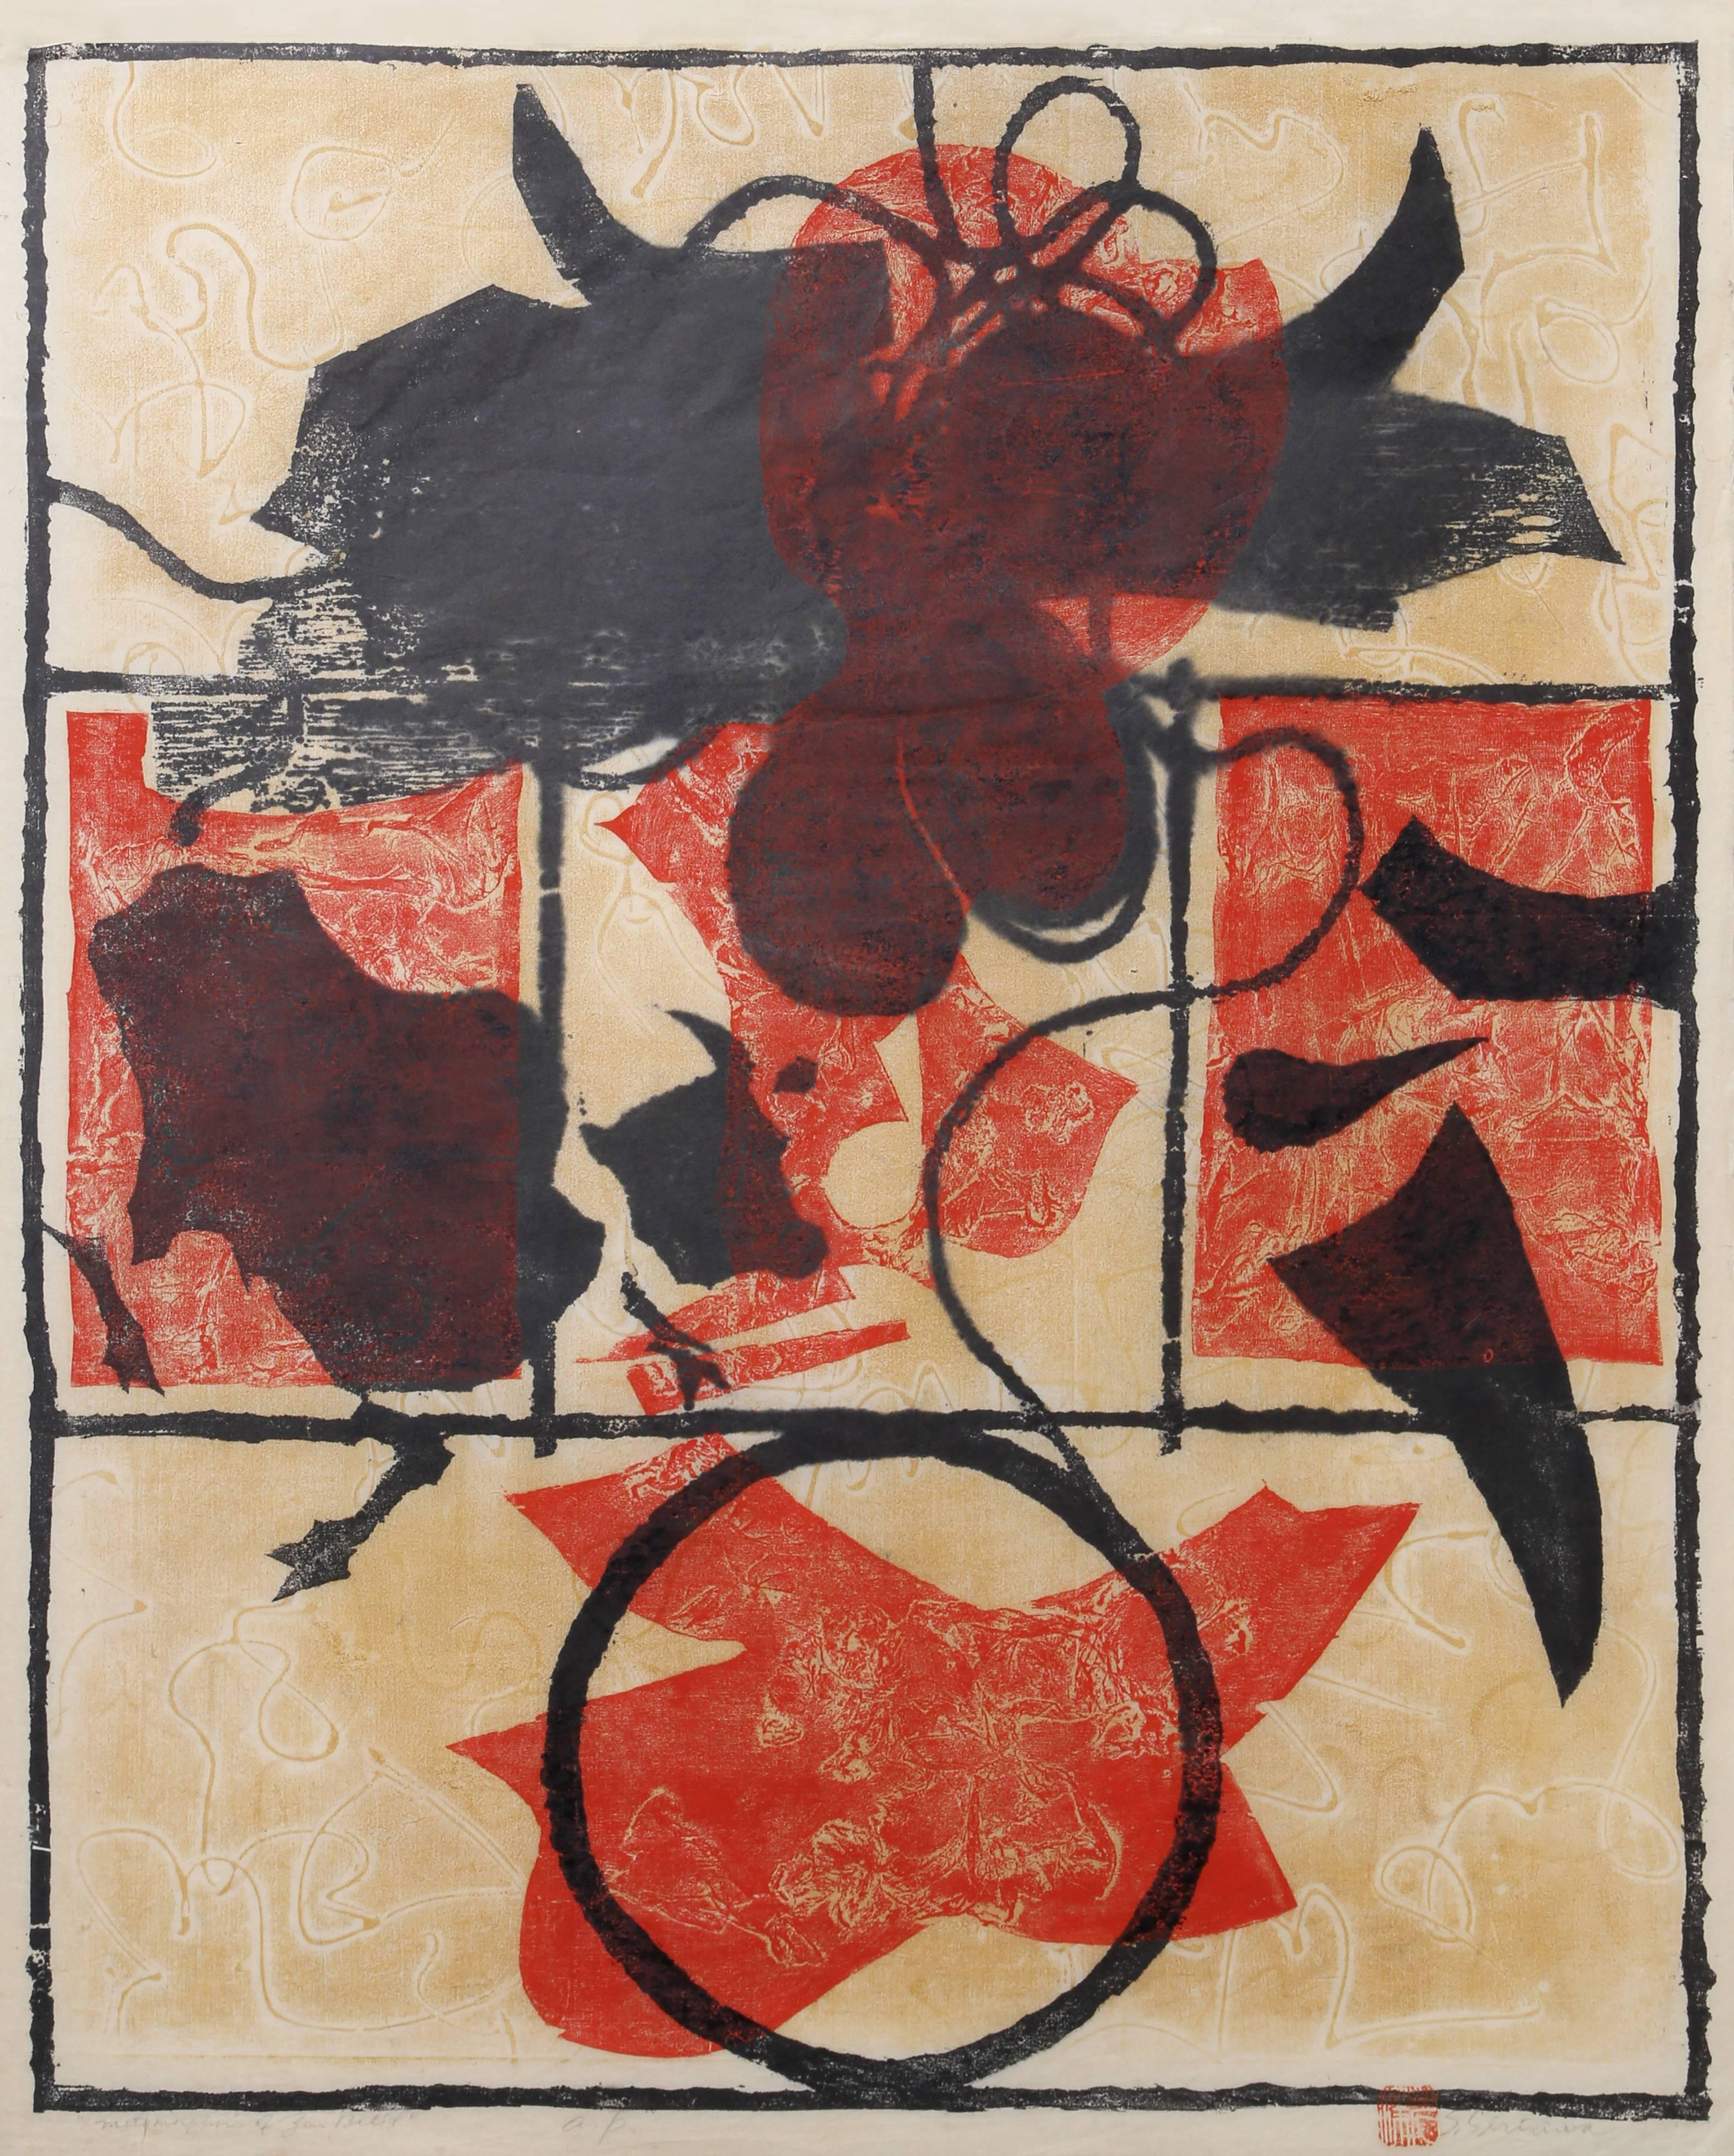 Metamorphosis of Zan Biell